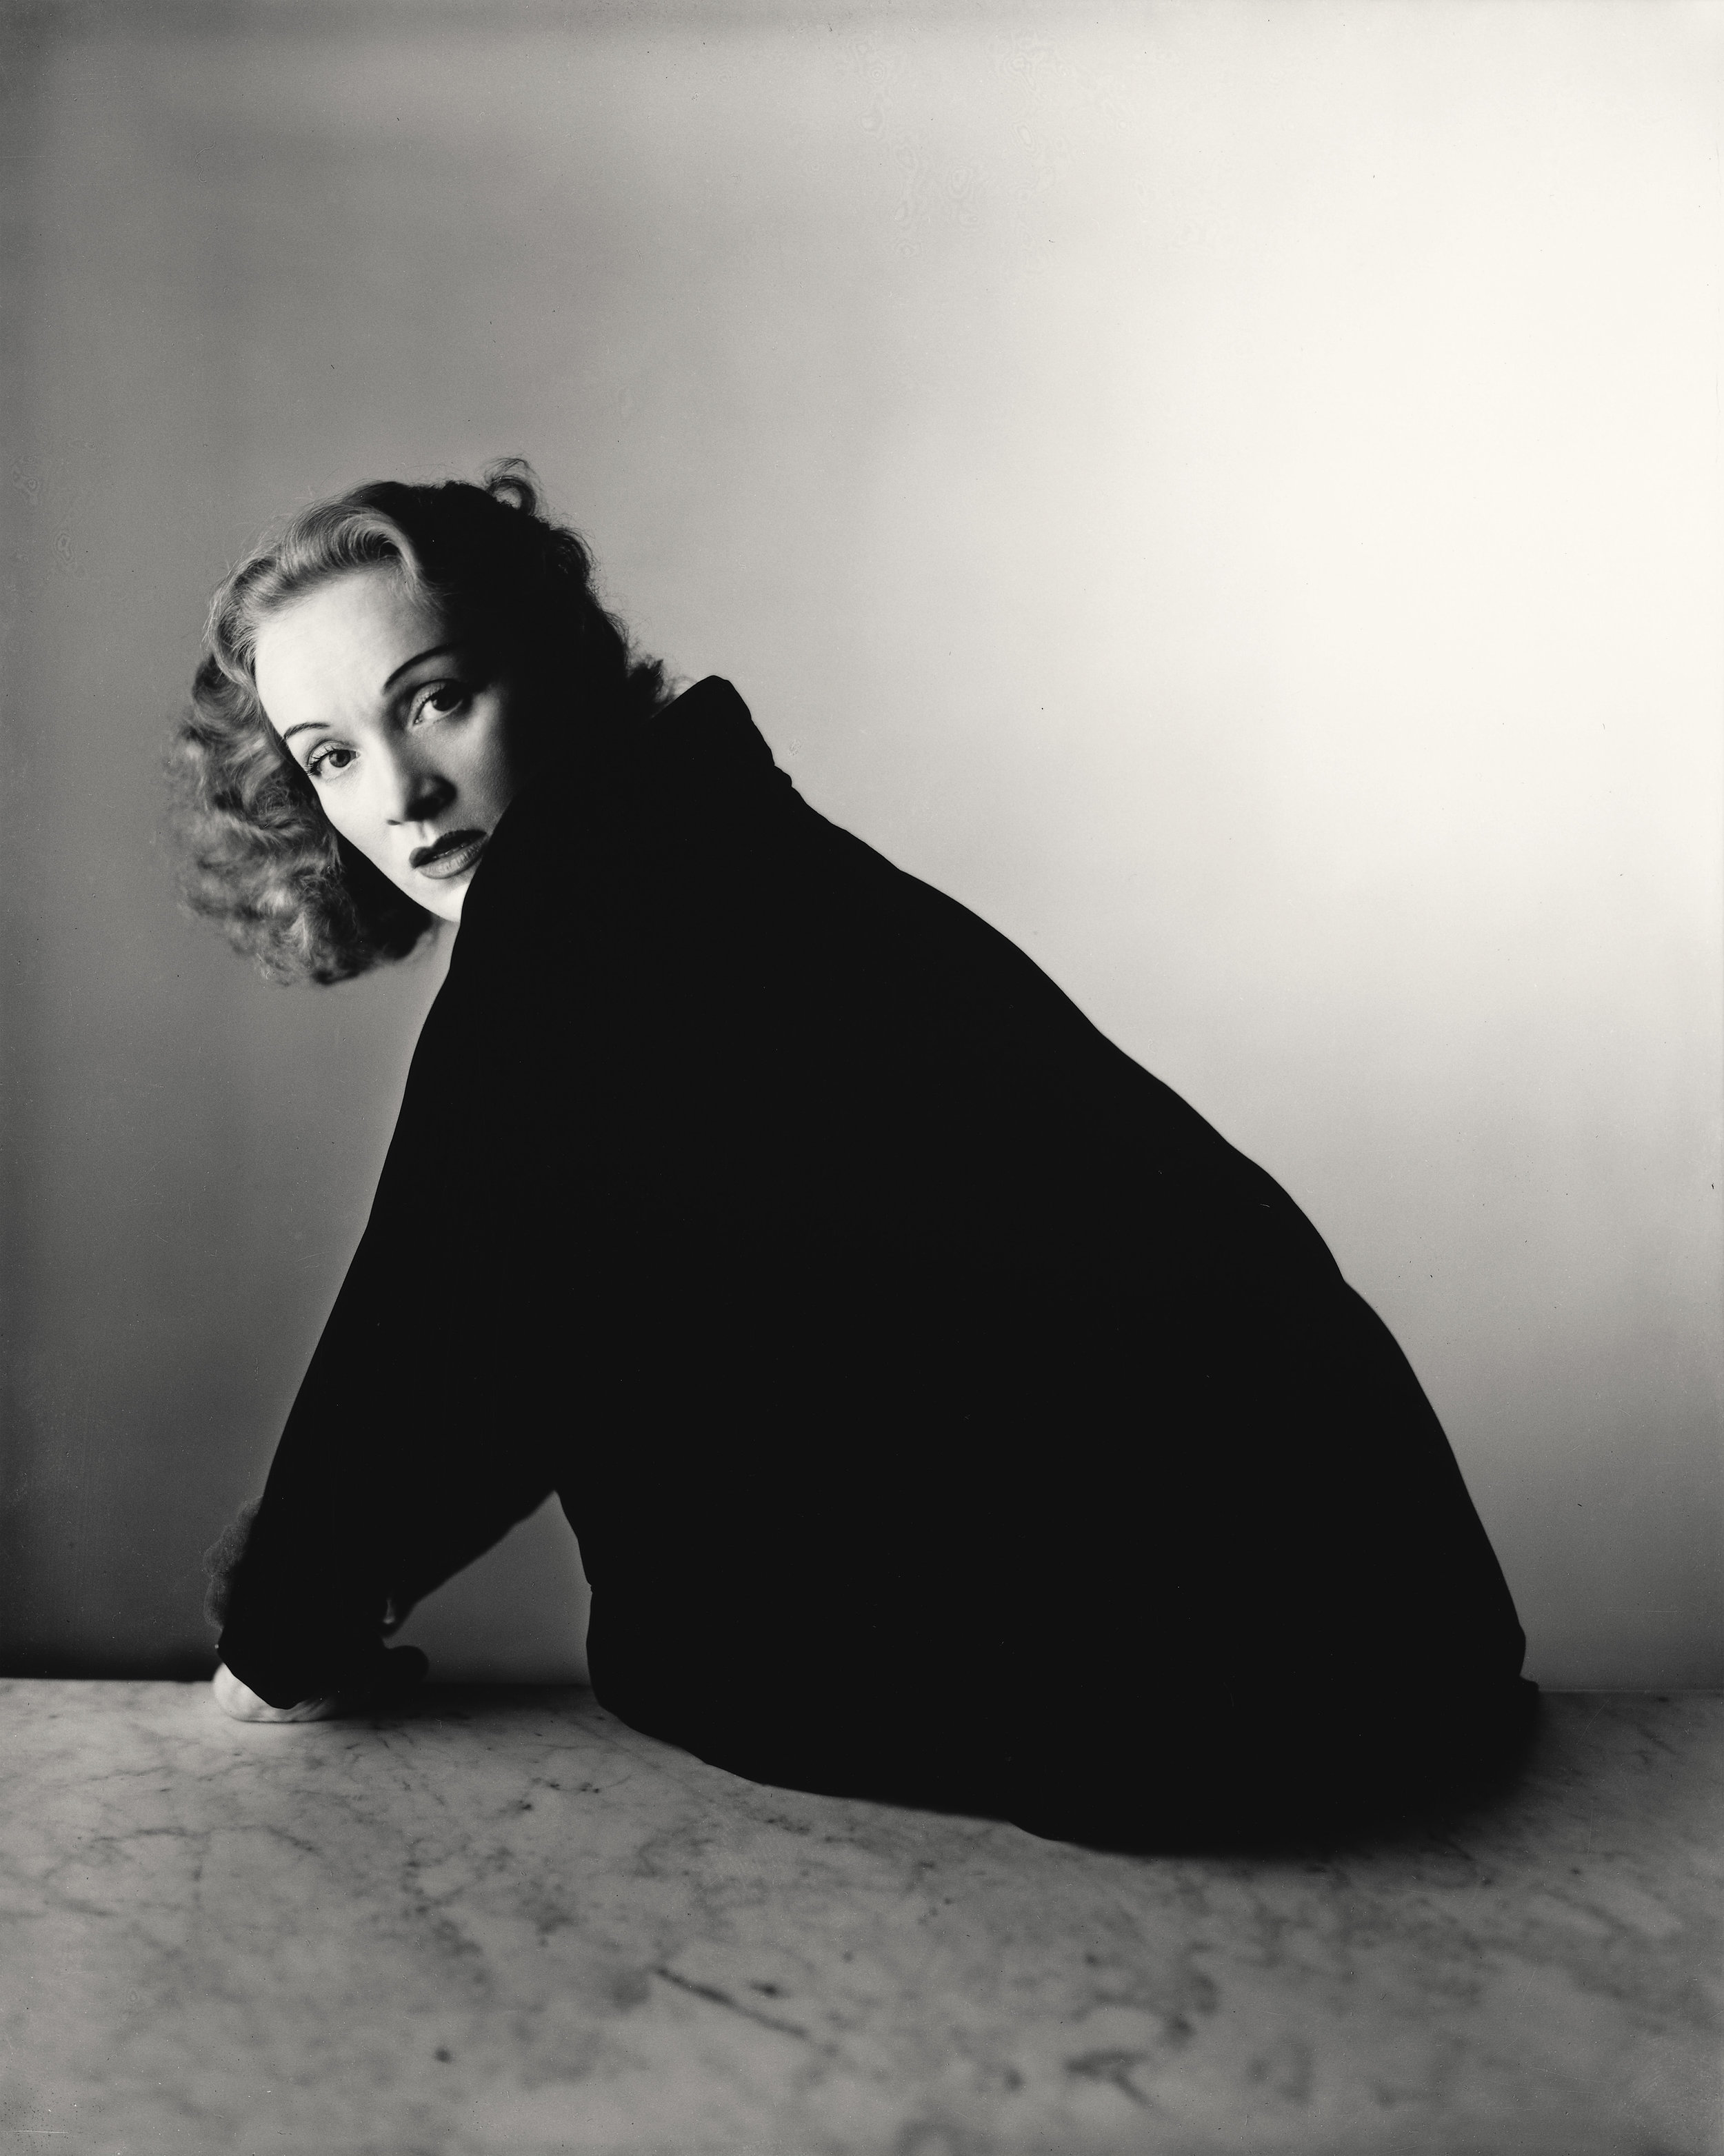 Irving Penn (American, 1917–2009)    Marlene Dietrich , New York, 1948    Gelatin silver print, 2000  10 × 8 1/8 in. (25.4 × 20.6 cm)  The Metropolitan Museum of Art, New York  Promised Gift of The Irving Penn Foundation  © The Irving Penn Foundation